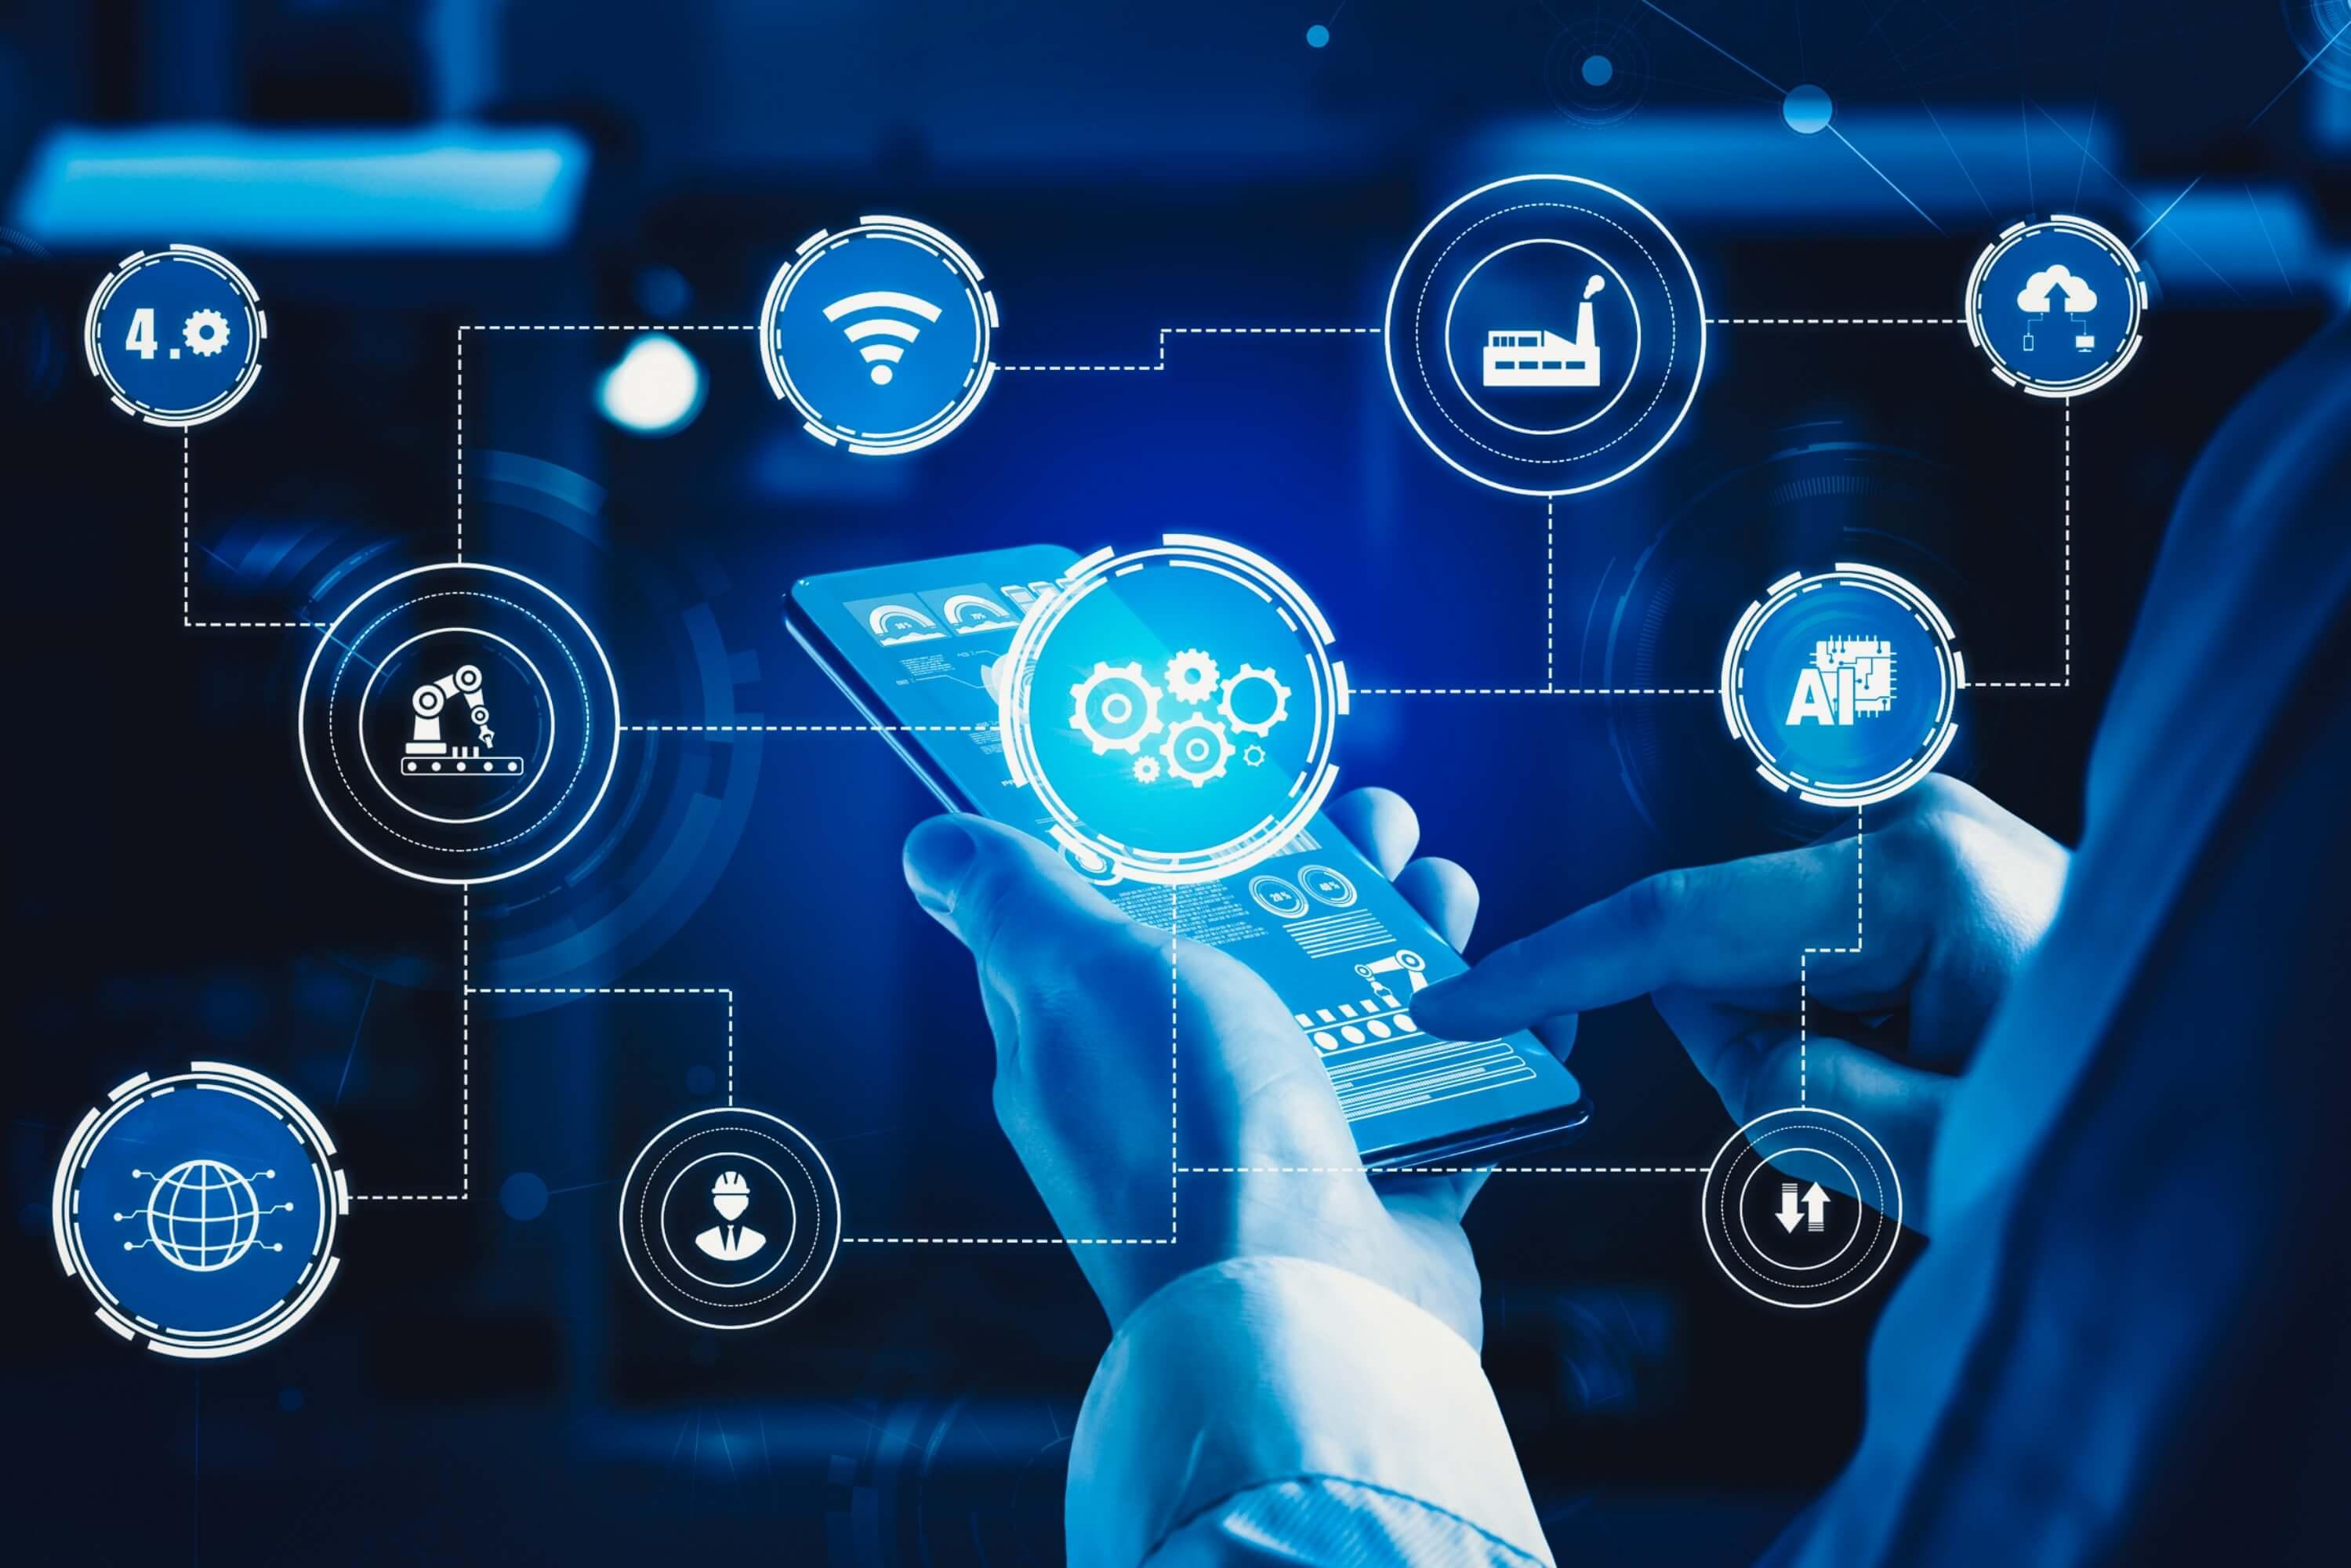 ¿Qué-implementará-un-sistema-de-automatización-de-procesos